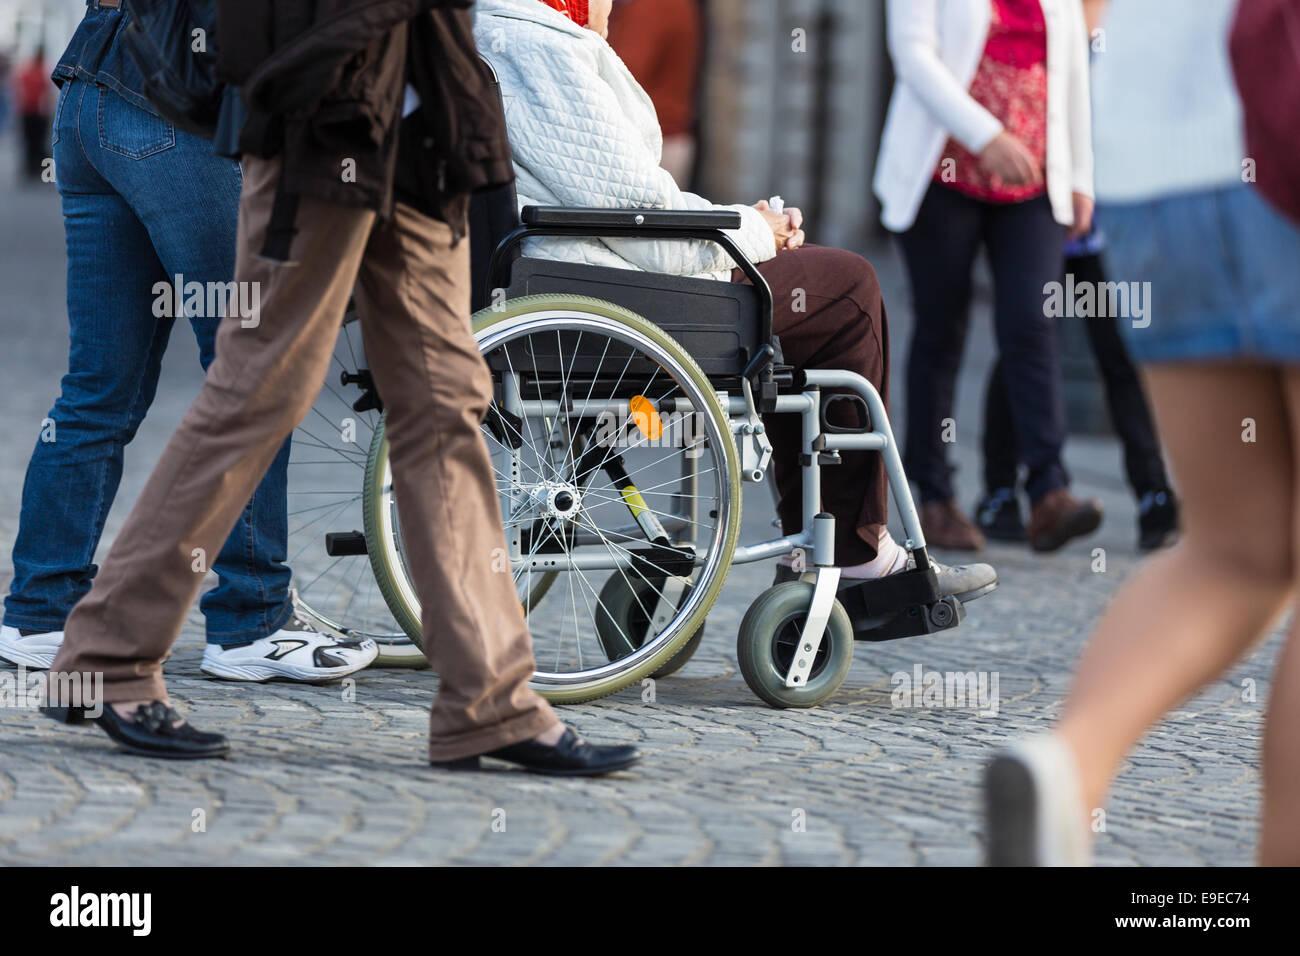 Behinderung. Stockbild